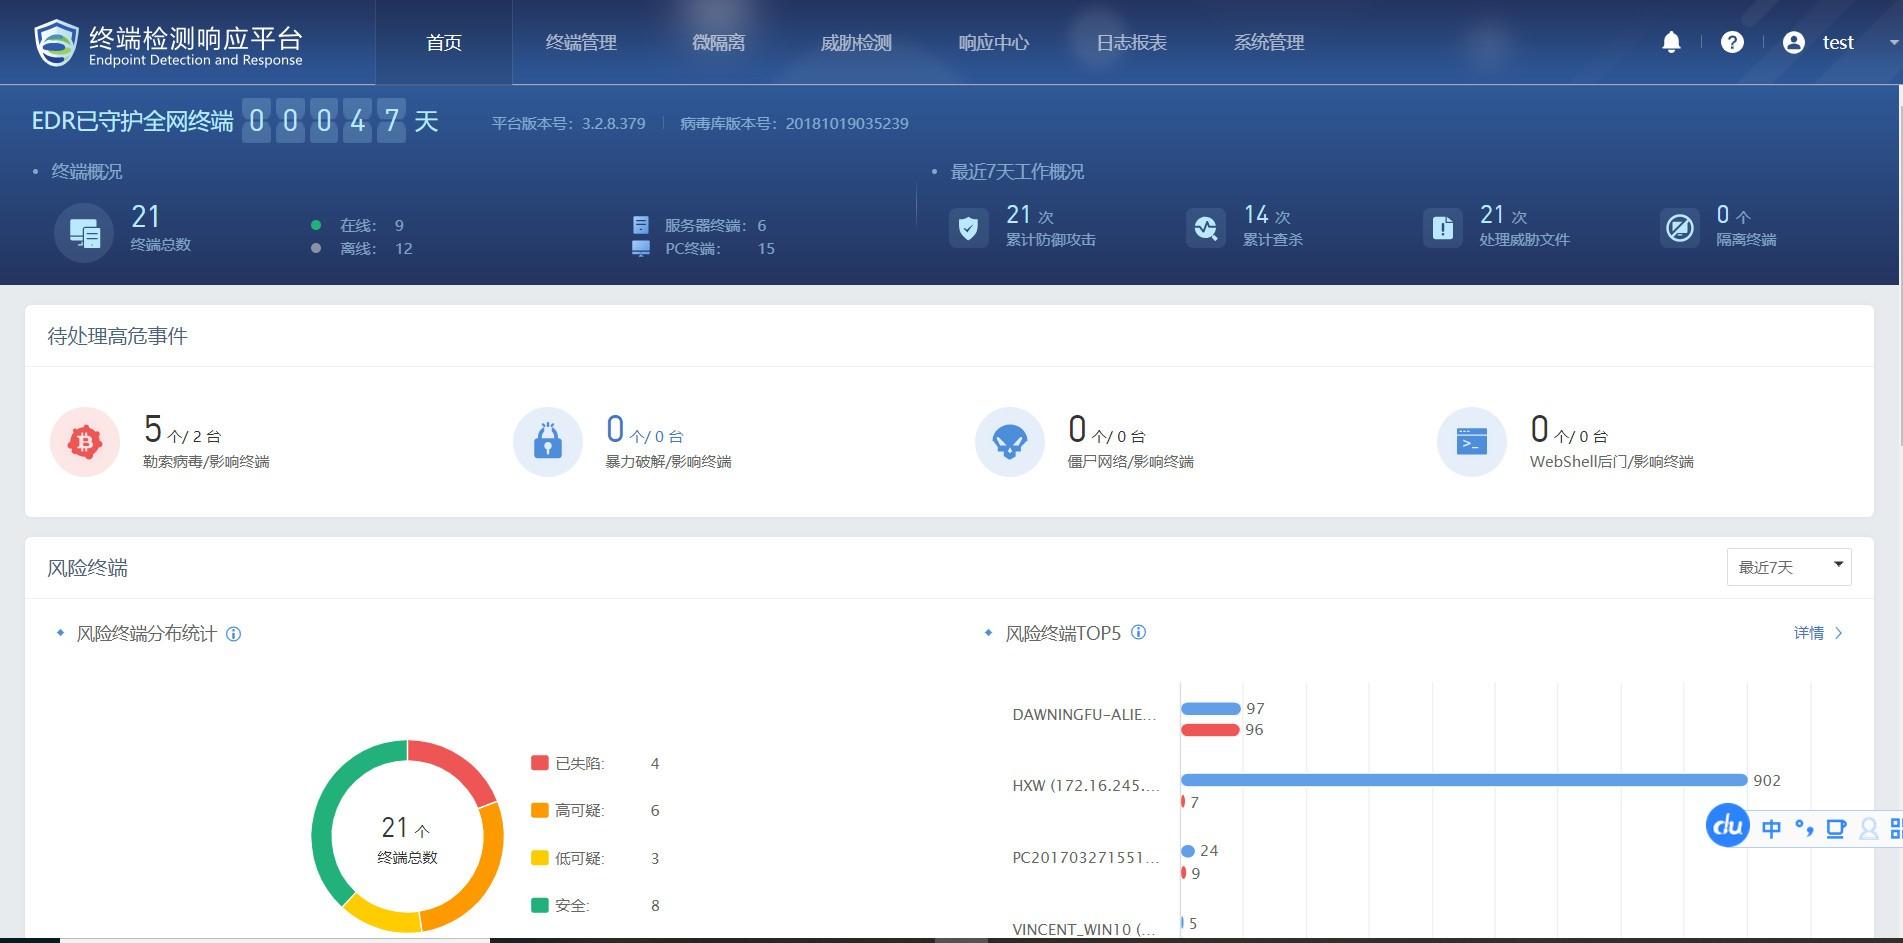 EDR智能终端检测平台